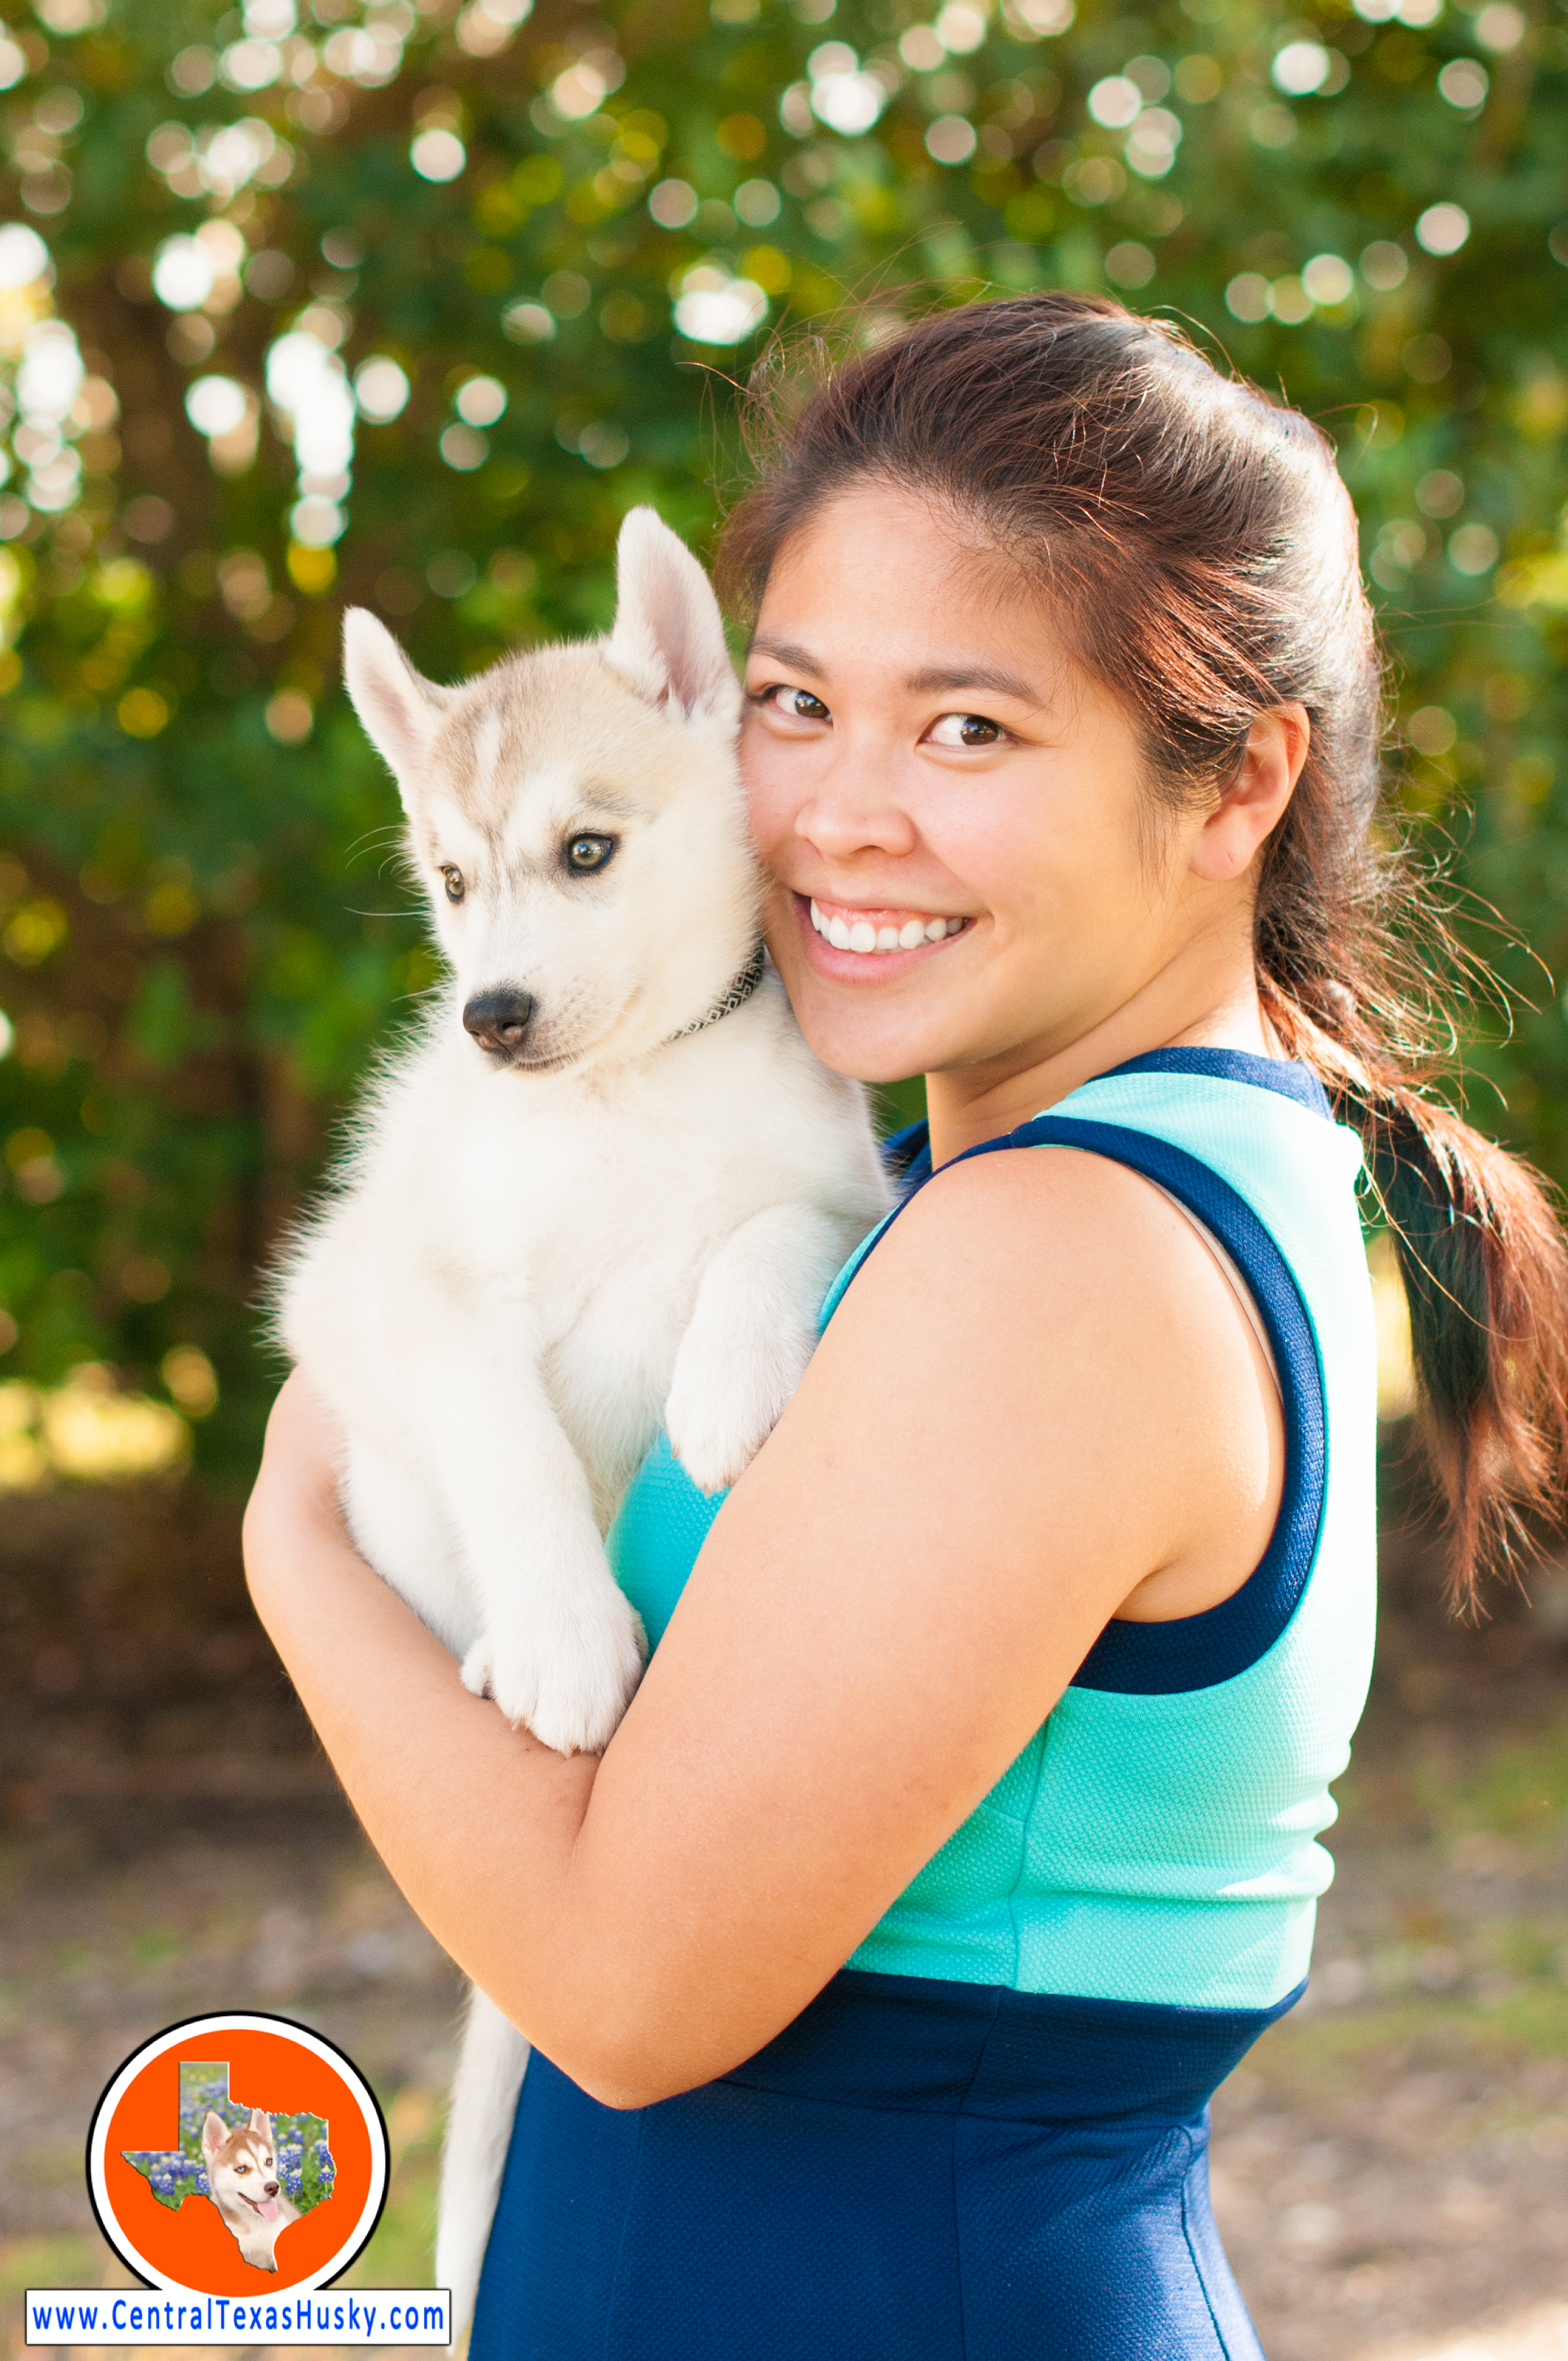 central-texas-husky_austin-siberian-husky-breeder_7731_20171020